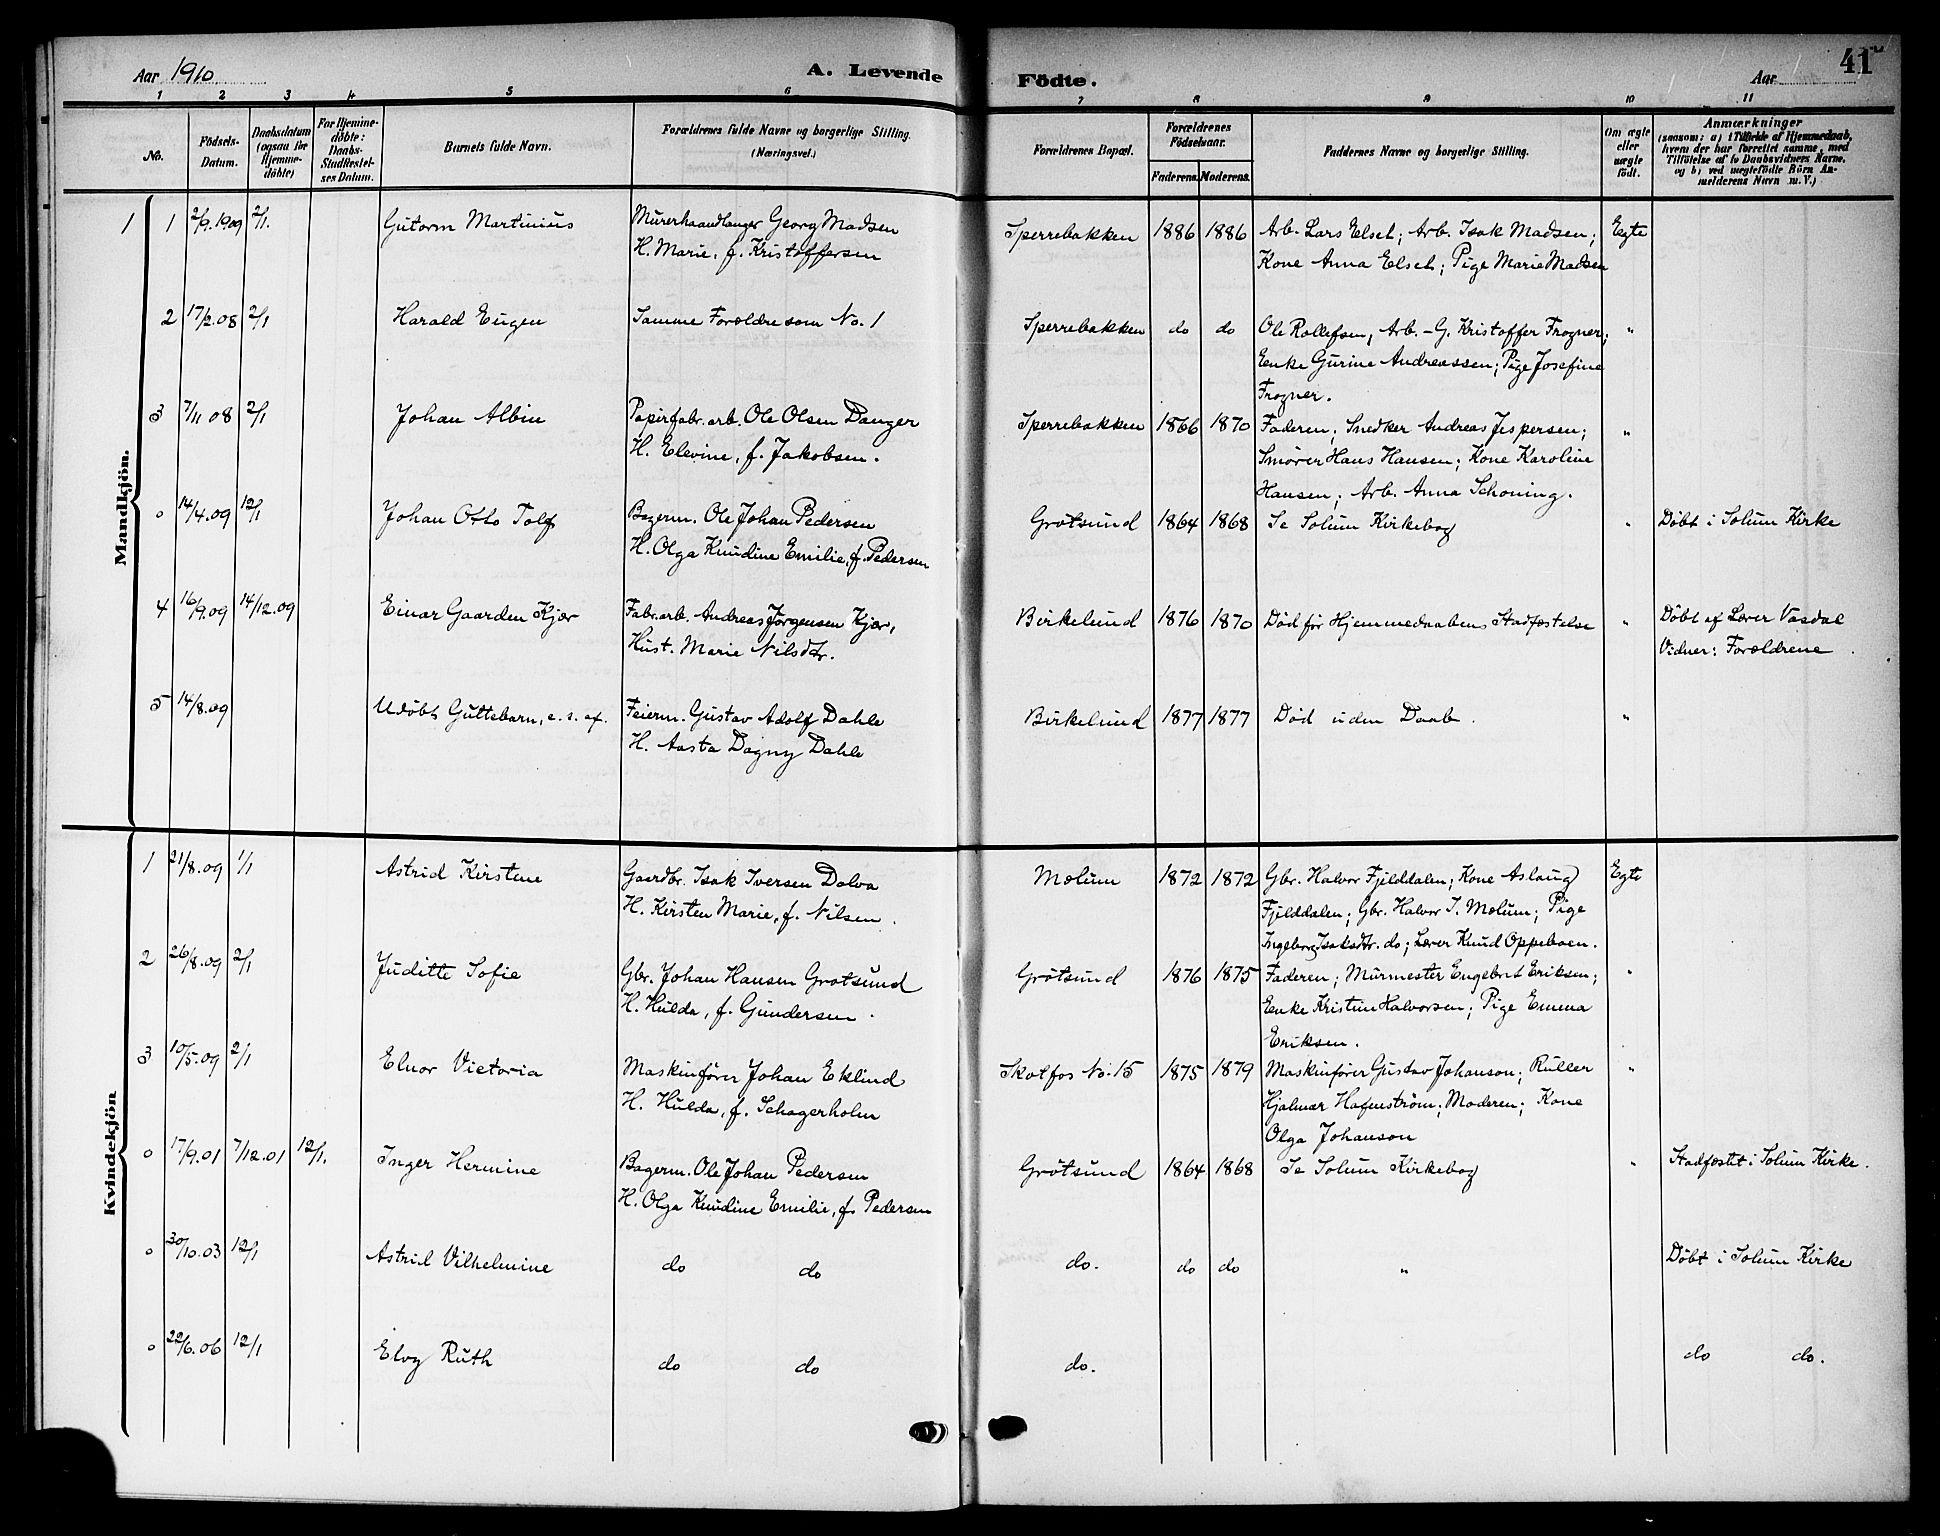 SAKO, Solum kirkebøker, G/Gb/L0005: Klokkerbok nr. II 5, 1905-1914, s. 41